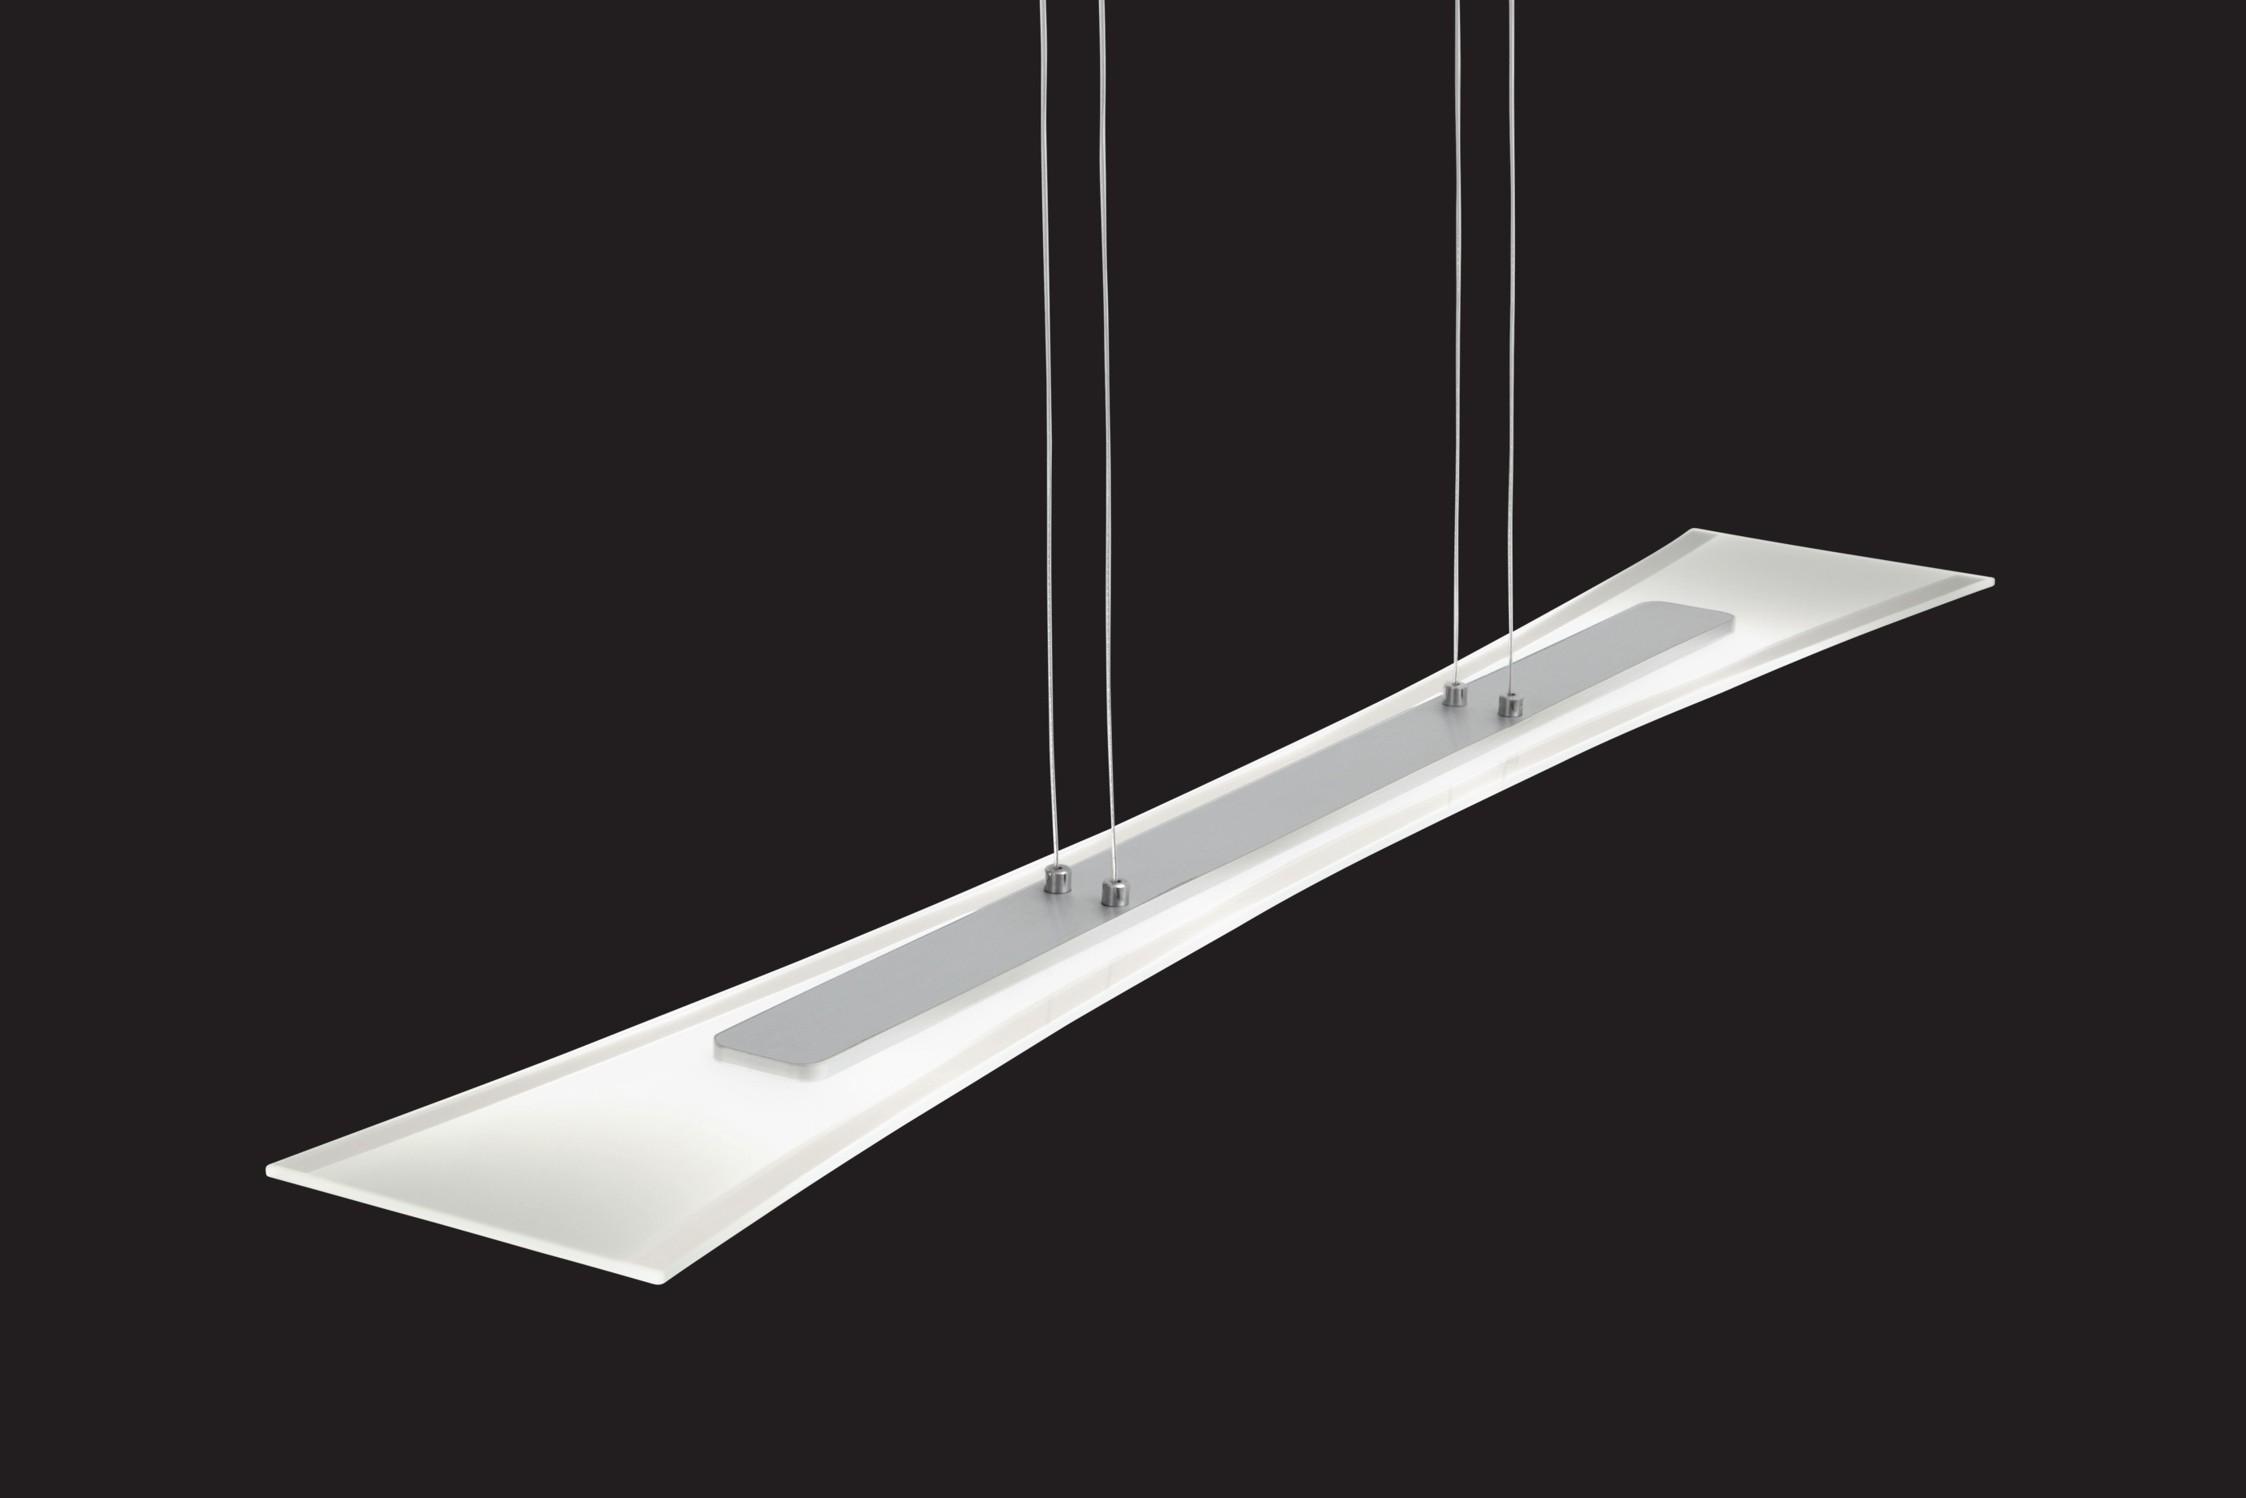 322510406 led pendelleuchte 4 flammig aluminium geb rstet 099000 trio ebay. Black Bedroom Furniture Sets. Home Design Ideas